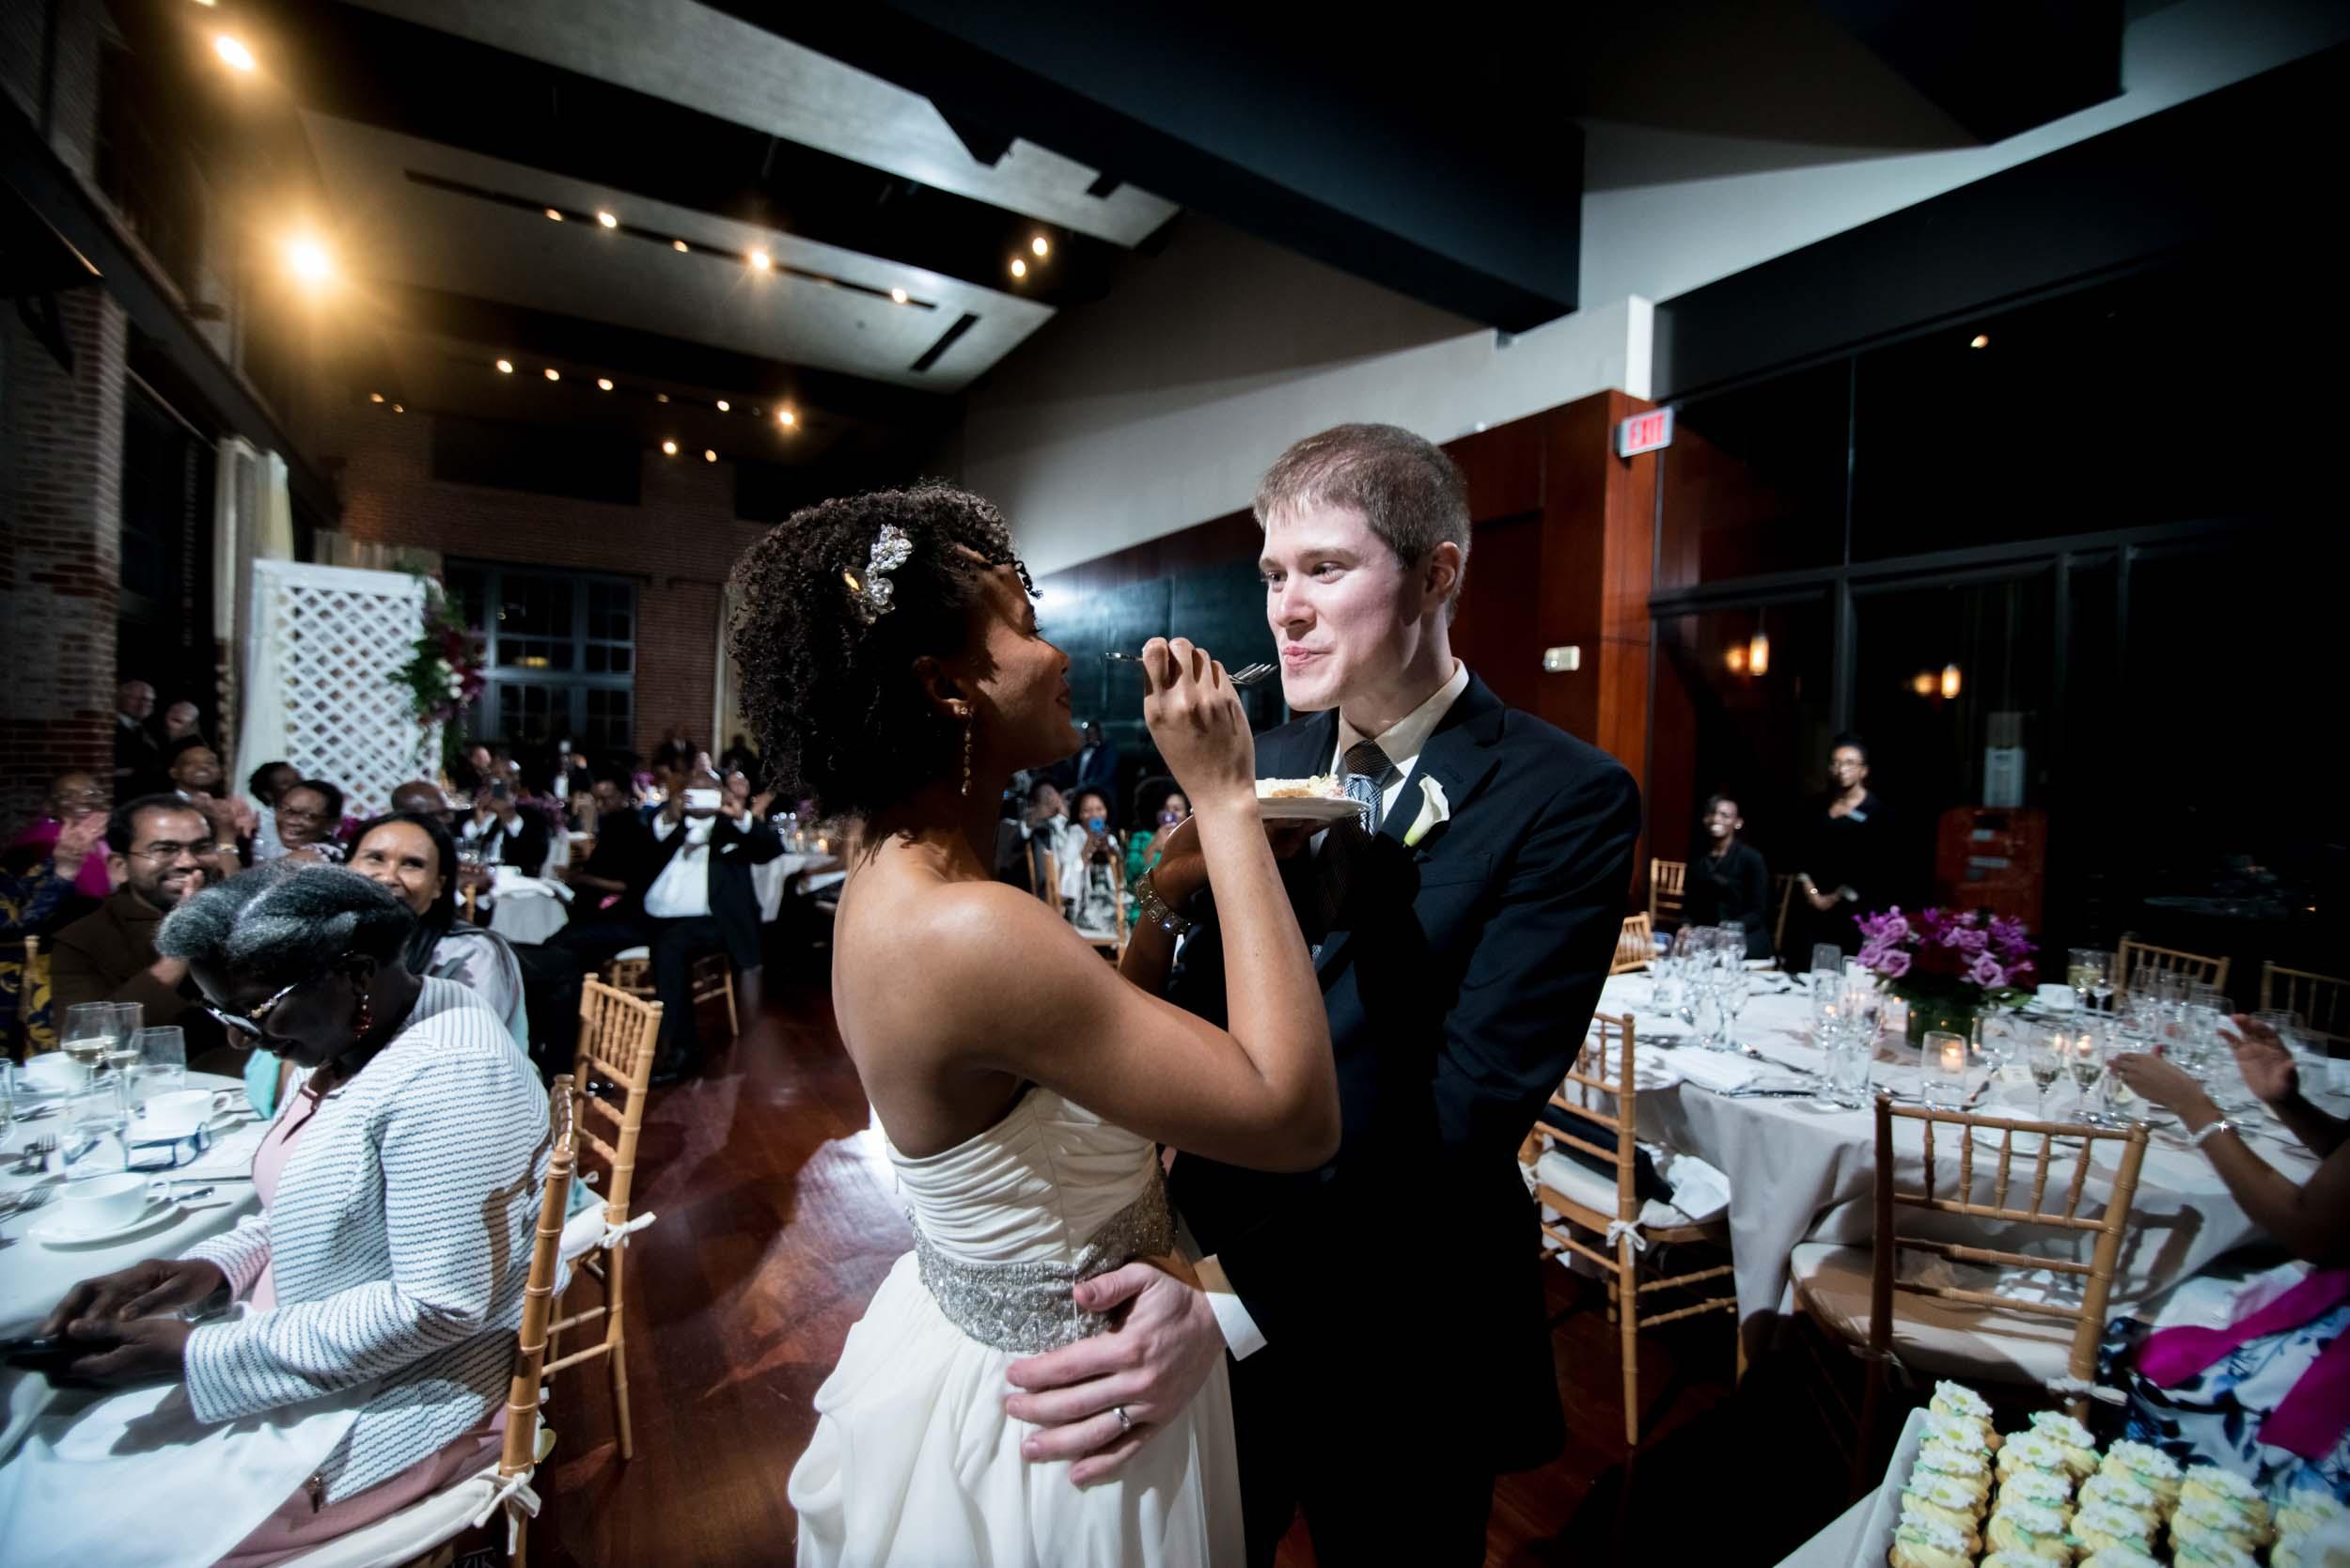 dc+metro+wedding+photographer+vadym+guliuk+photography+wedding+cake-cutting-2026.jpg